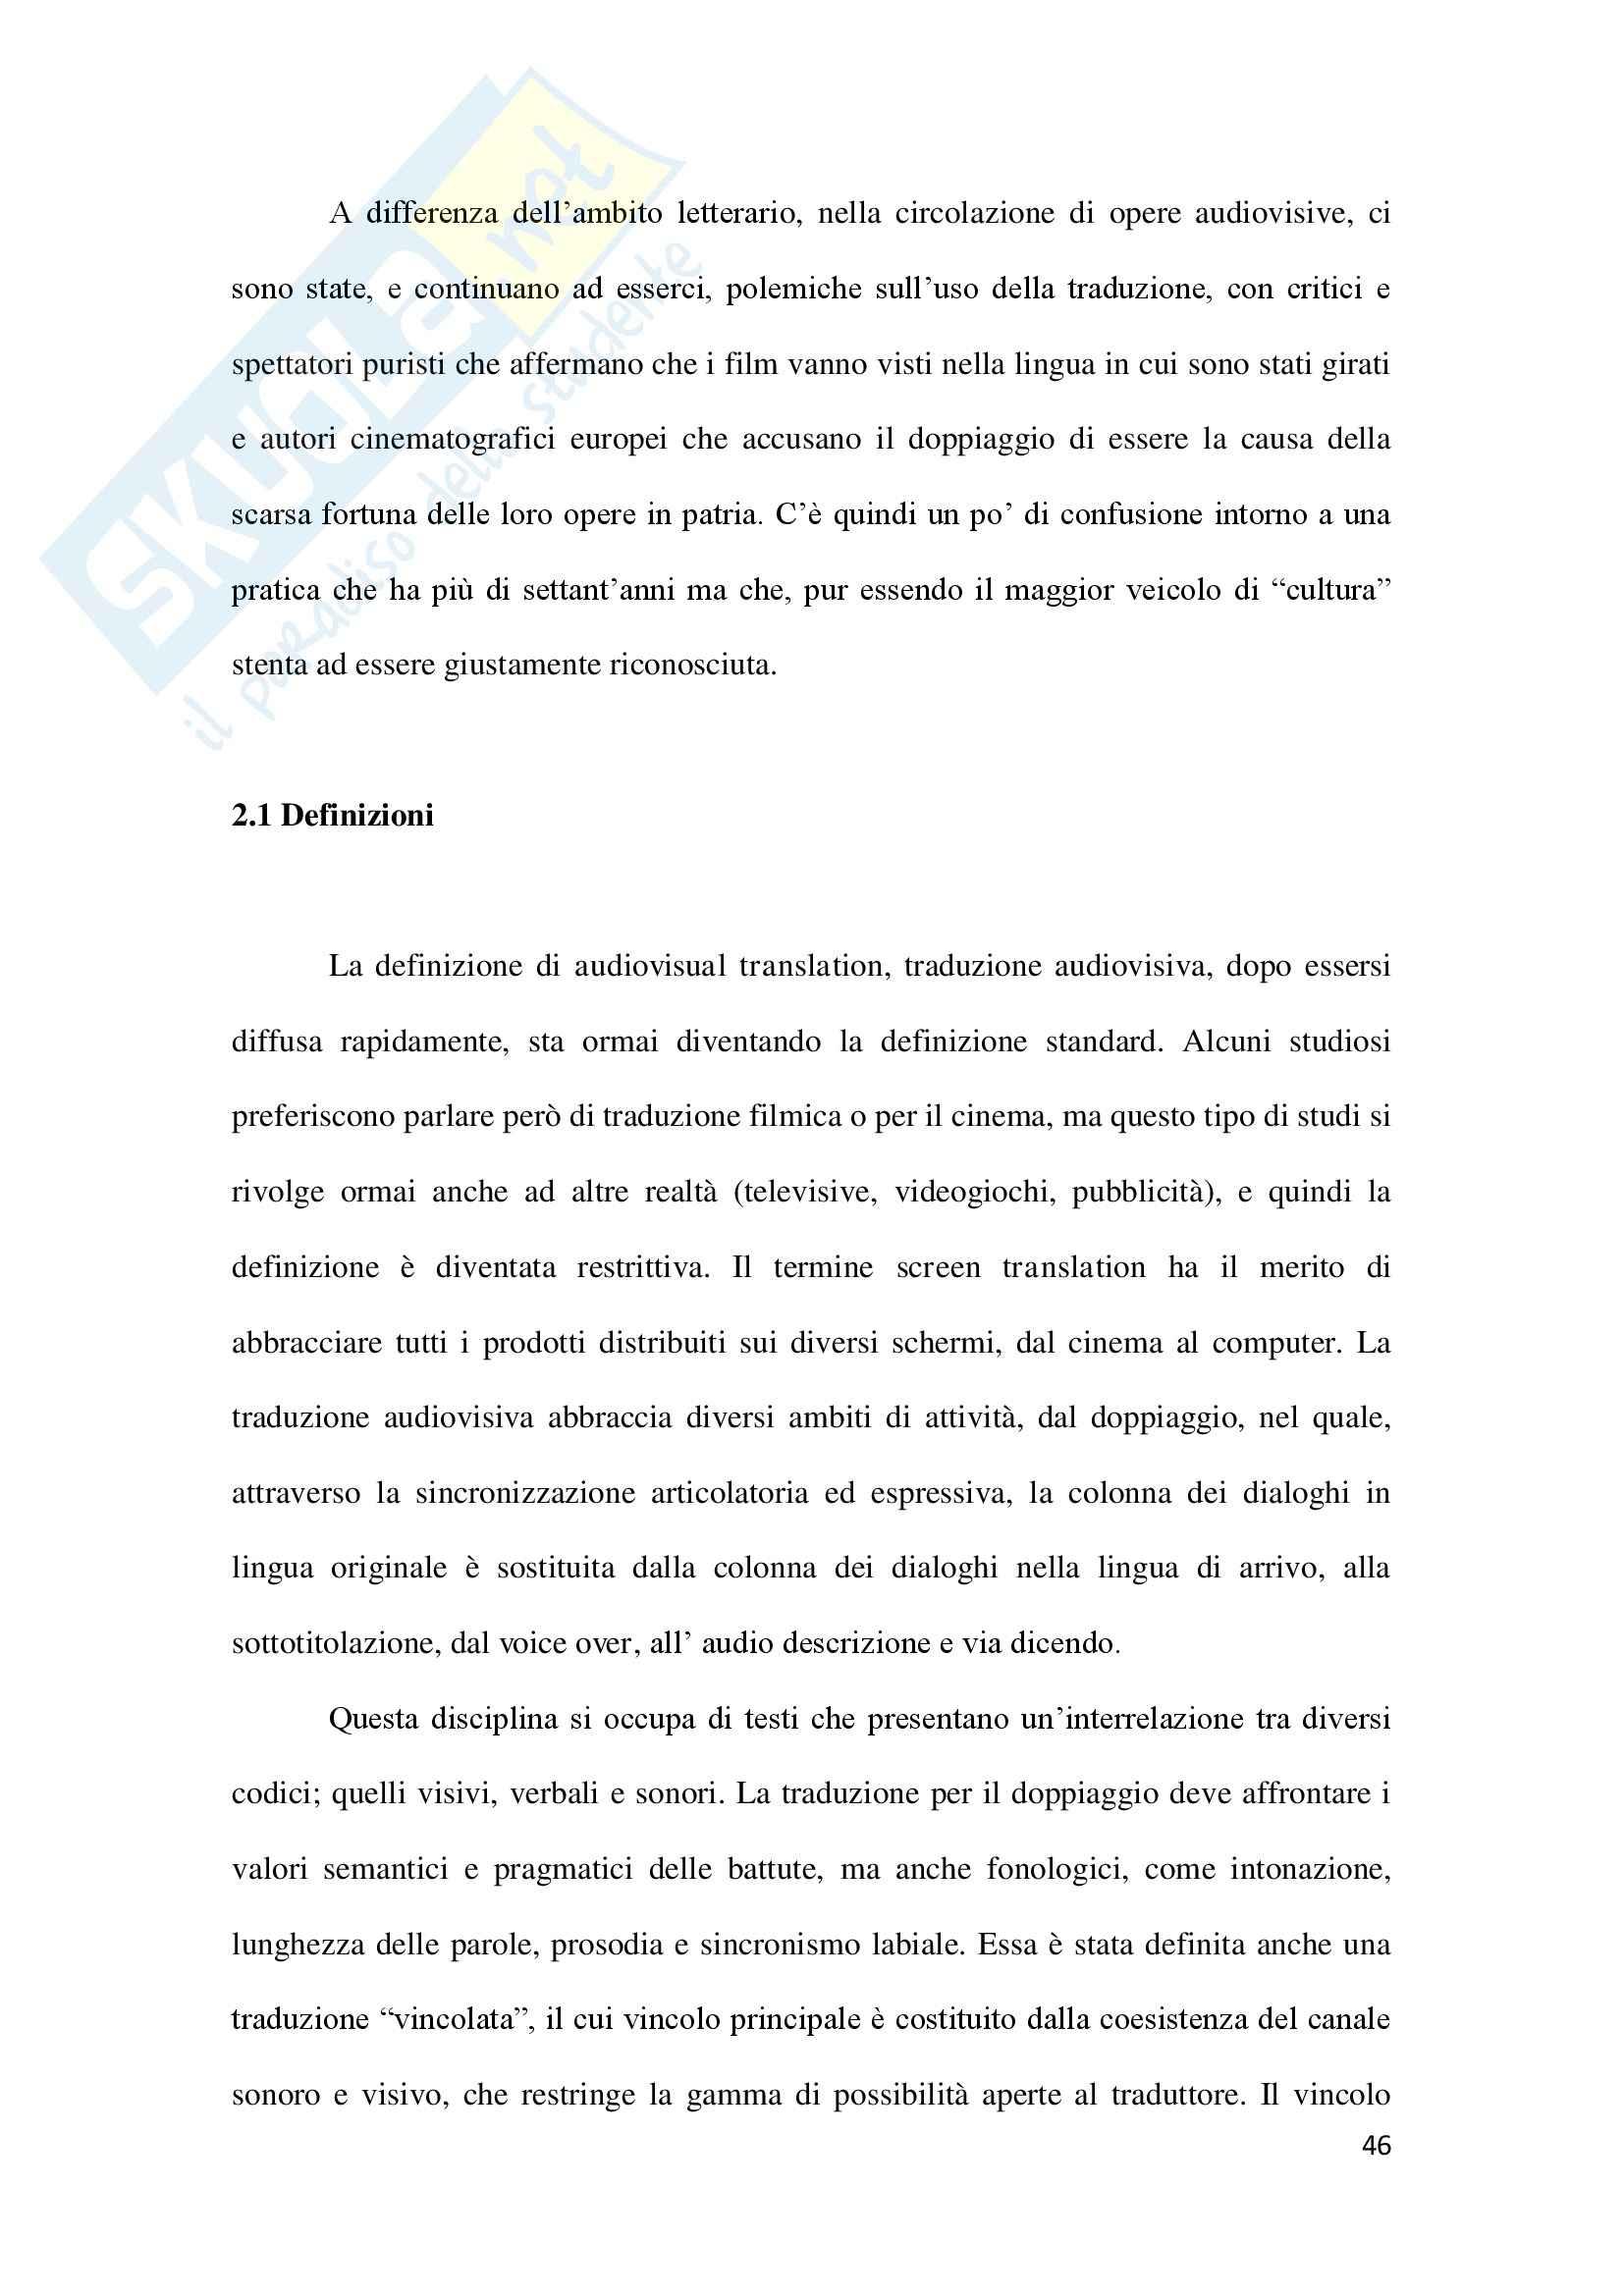 Linguaggio di Internet, Lingua inglese Pag. 46